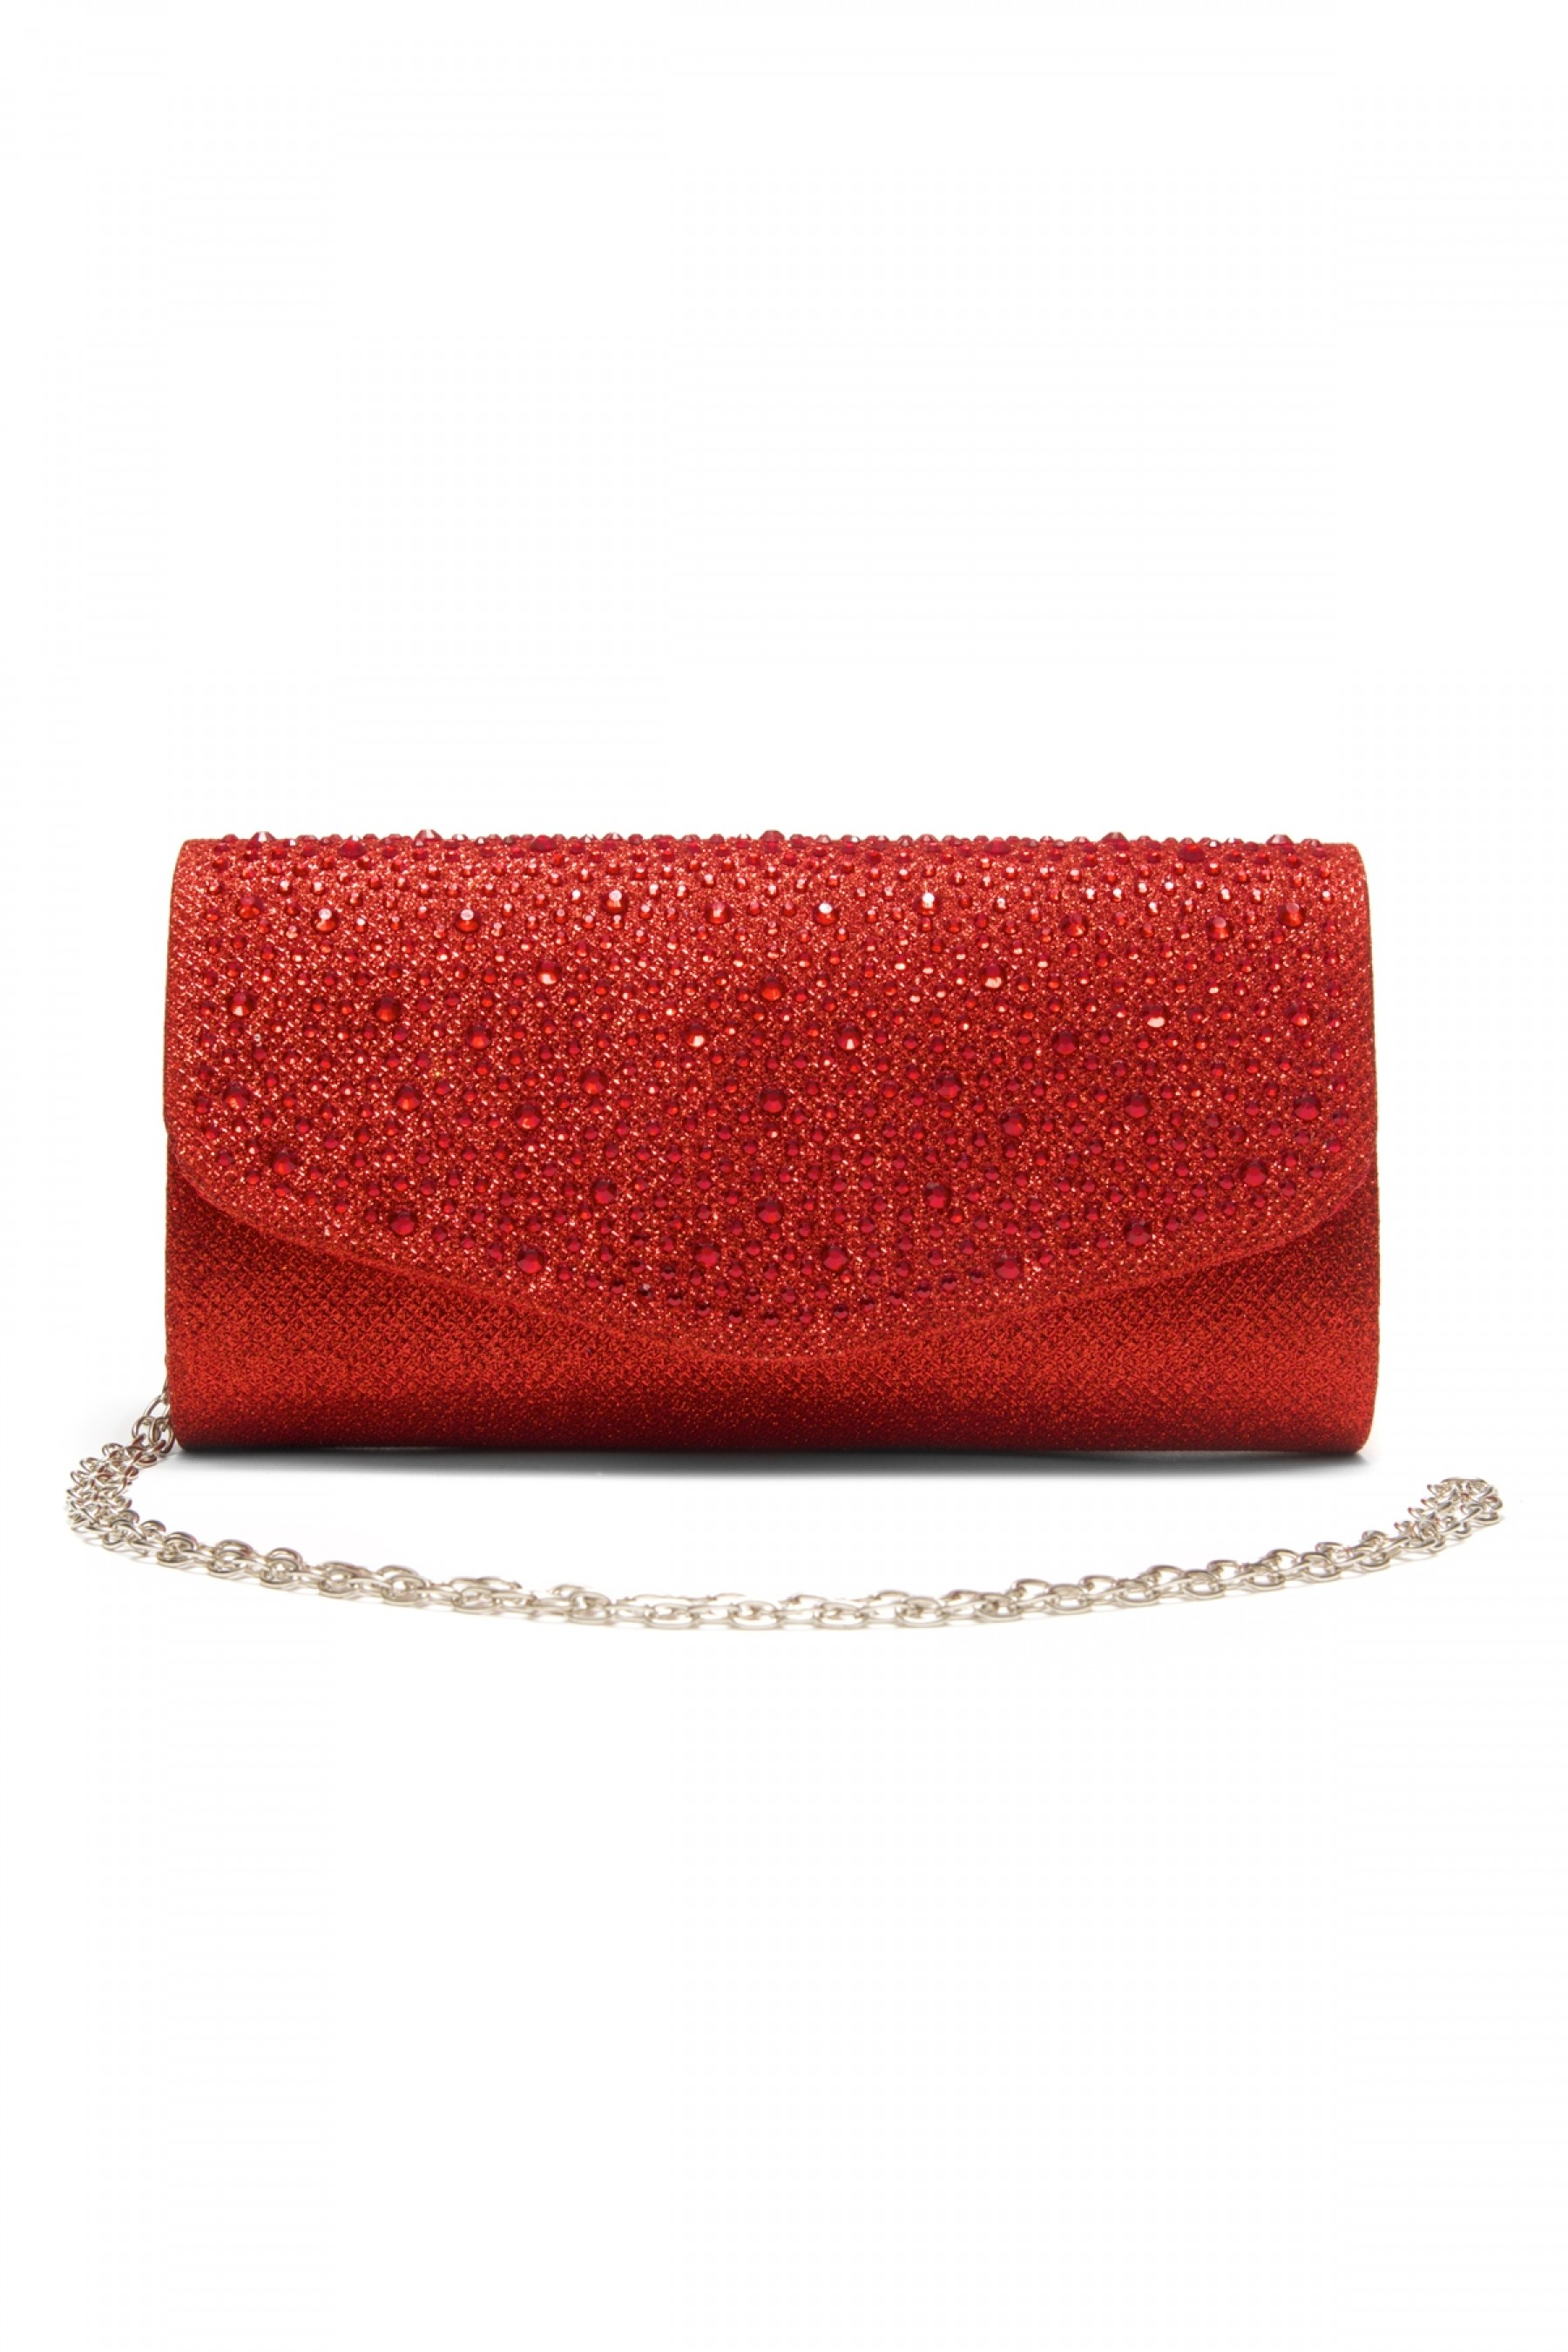 SZY-8808-Glittering Womens Flap Evening Purse (Red)